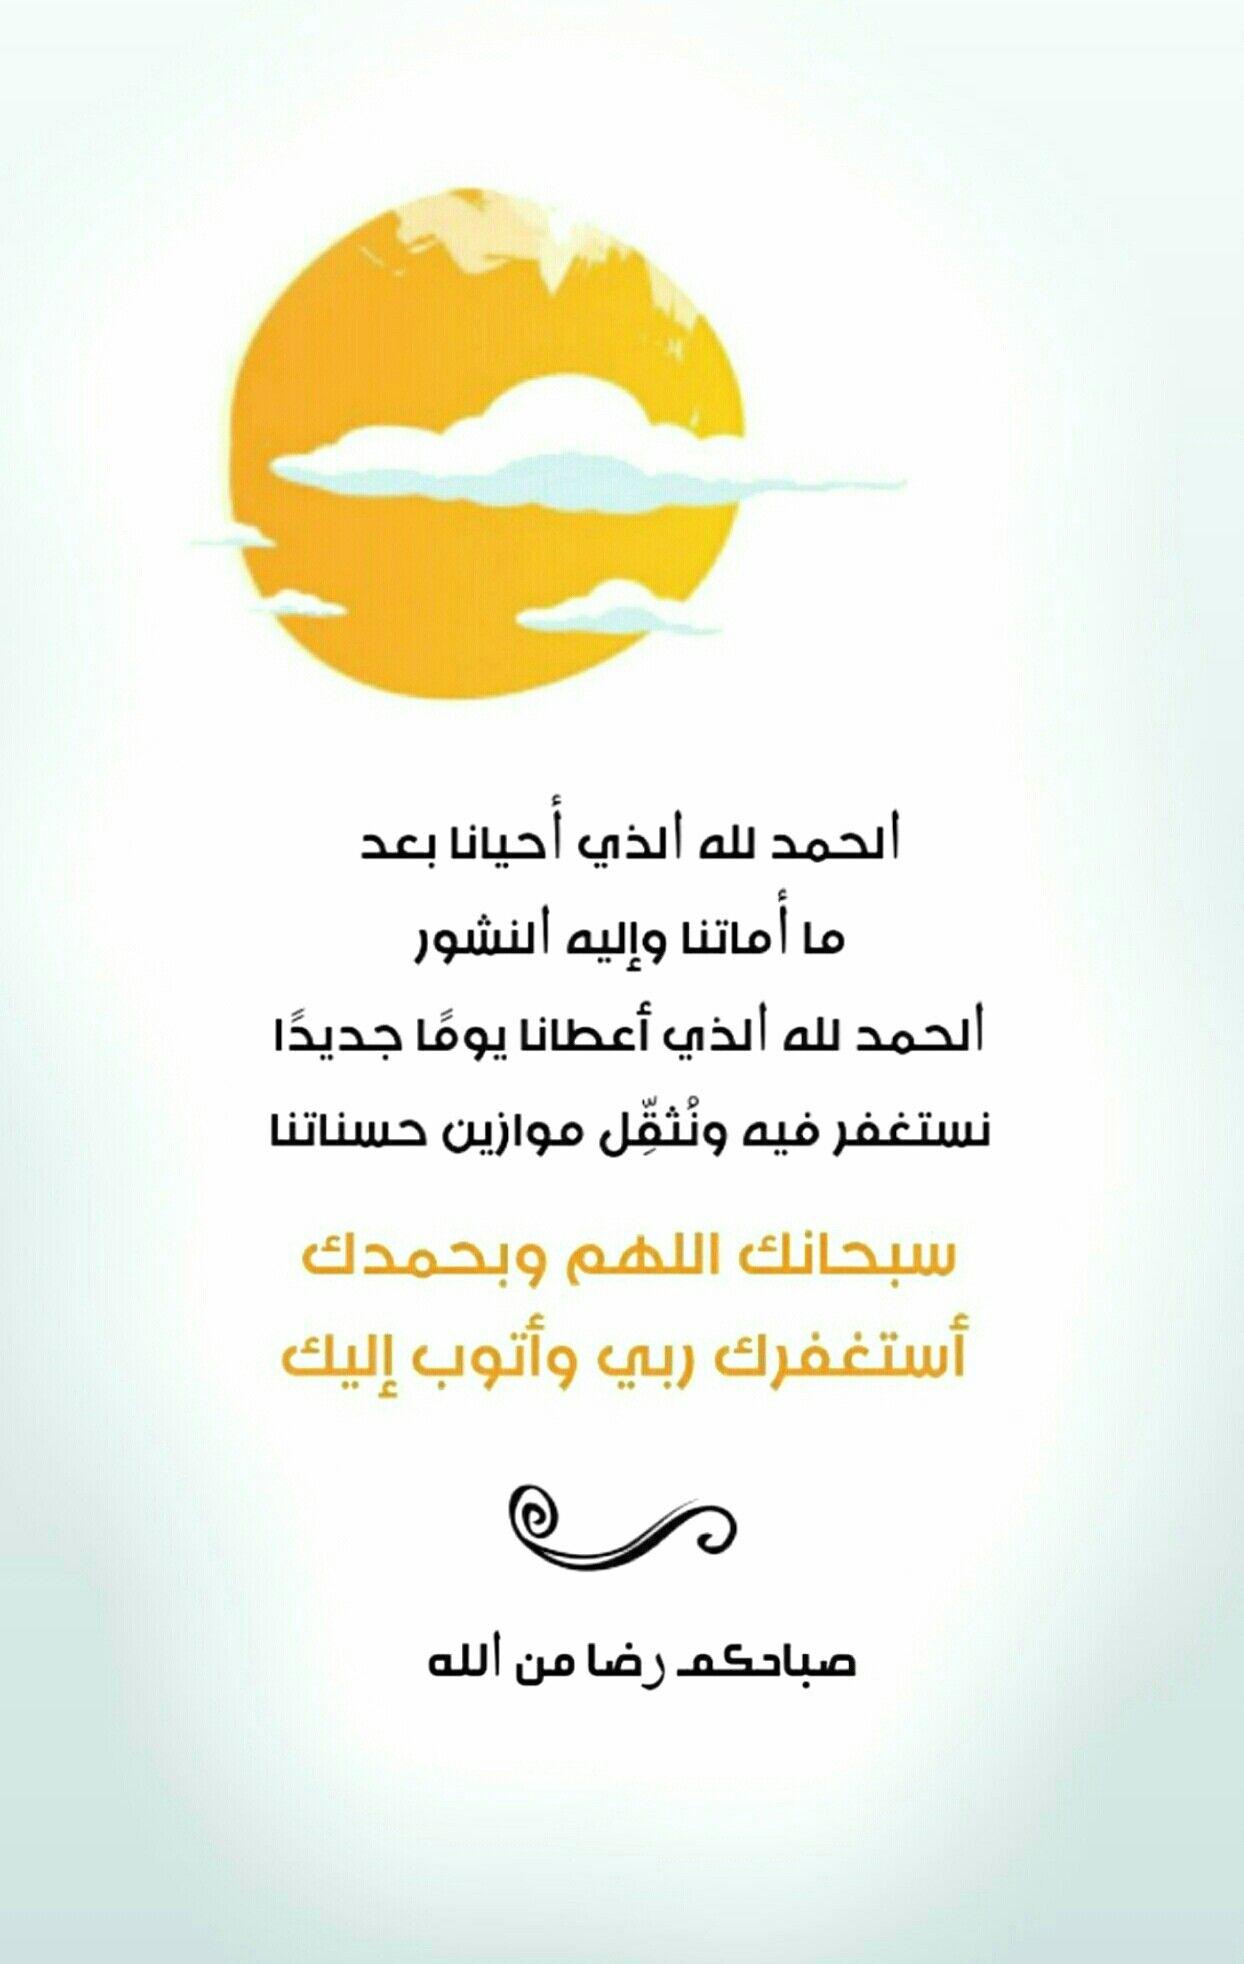 ﺍﻟﺤﻤﺪ ﻟﻠﻪ ﺍﻟﺬﻱ ﺃﺣﻴﺎﻧﺎ ﺑﻌﺪ ﻣﺎ ﺃﻣﺎﺗﻨﺎ ﻭﺇﻟﻴﻪ ﺍﻟﻨﺸﻮﺭ ﺍﻟﺤﻤﺪ ﻟﻠﻪ ﺍﻟﺬي ﺃﻋﻄﺎﻧﺎ ﻳﻮﻣ ﺎ ﺟﺪﻳﺪ ا ﻧﺴﺘﻐﻔﺮ ﻓﻴﻪ Good Morning Arabic Morning Quotes Beautiful Islamic Quotes